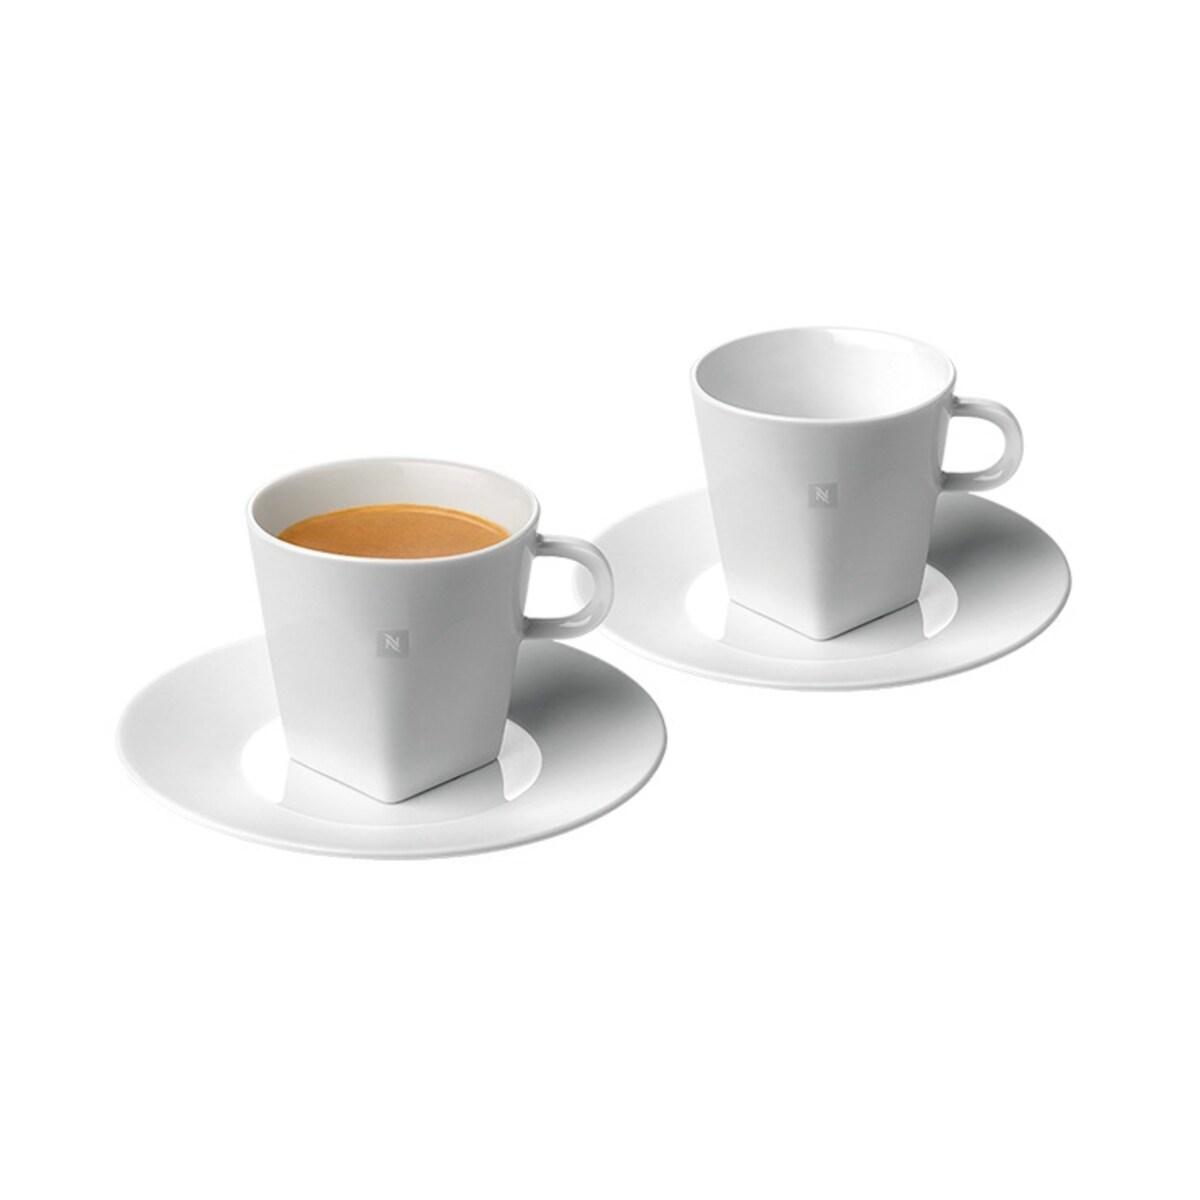 Nespresso Pure Lungo Collection - Комплект чаши за лунго, 2 бр